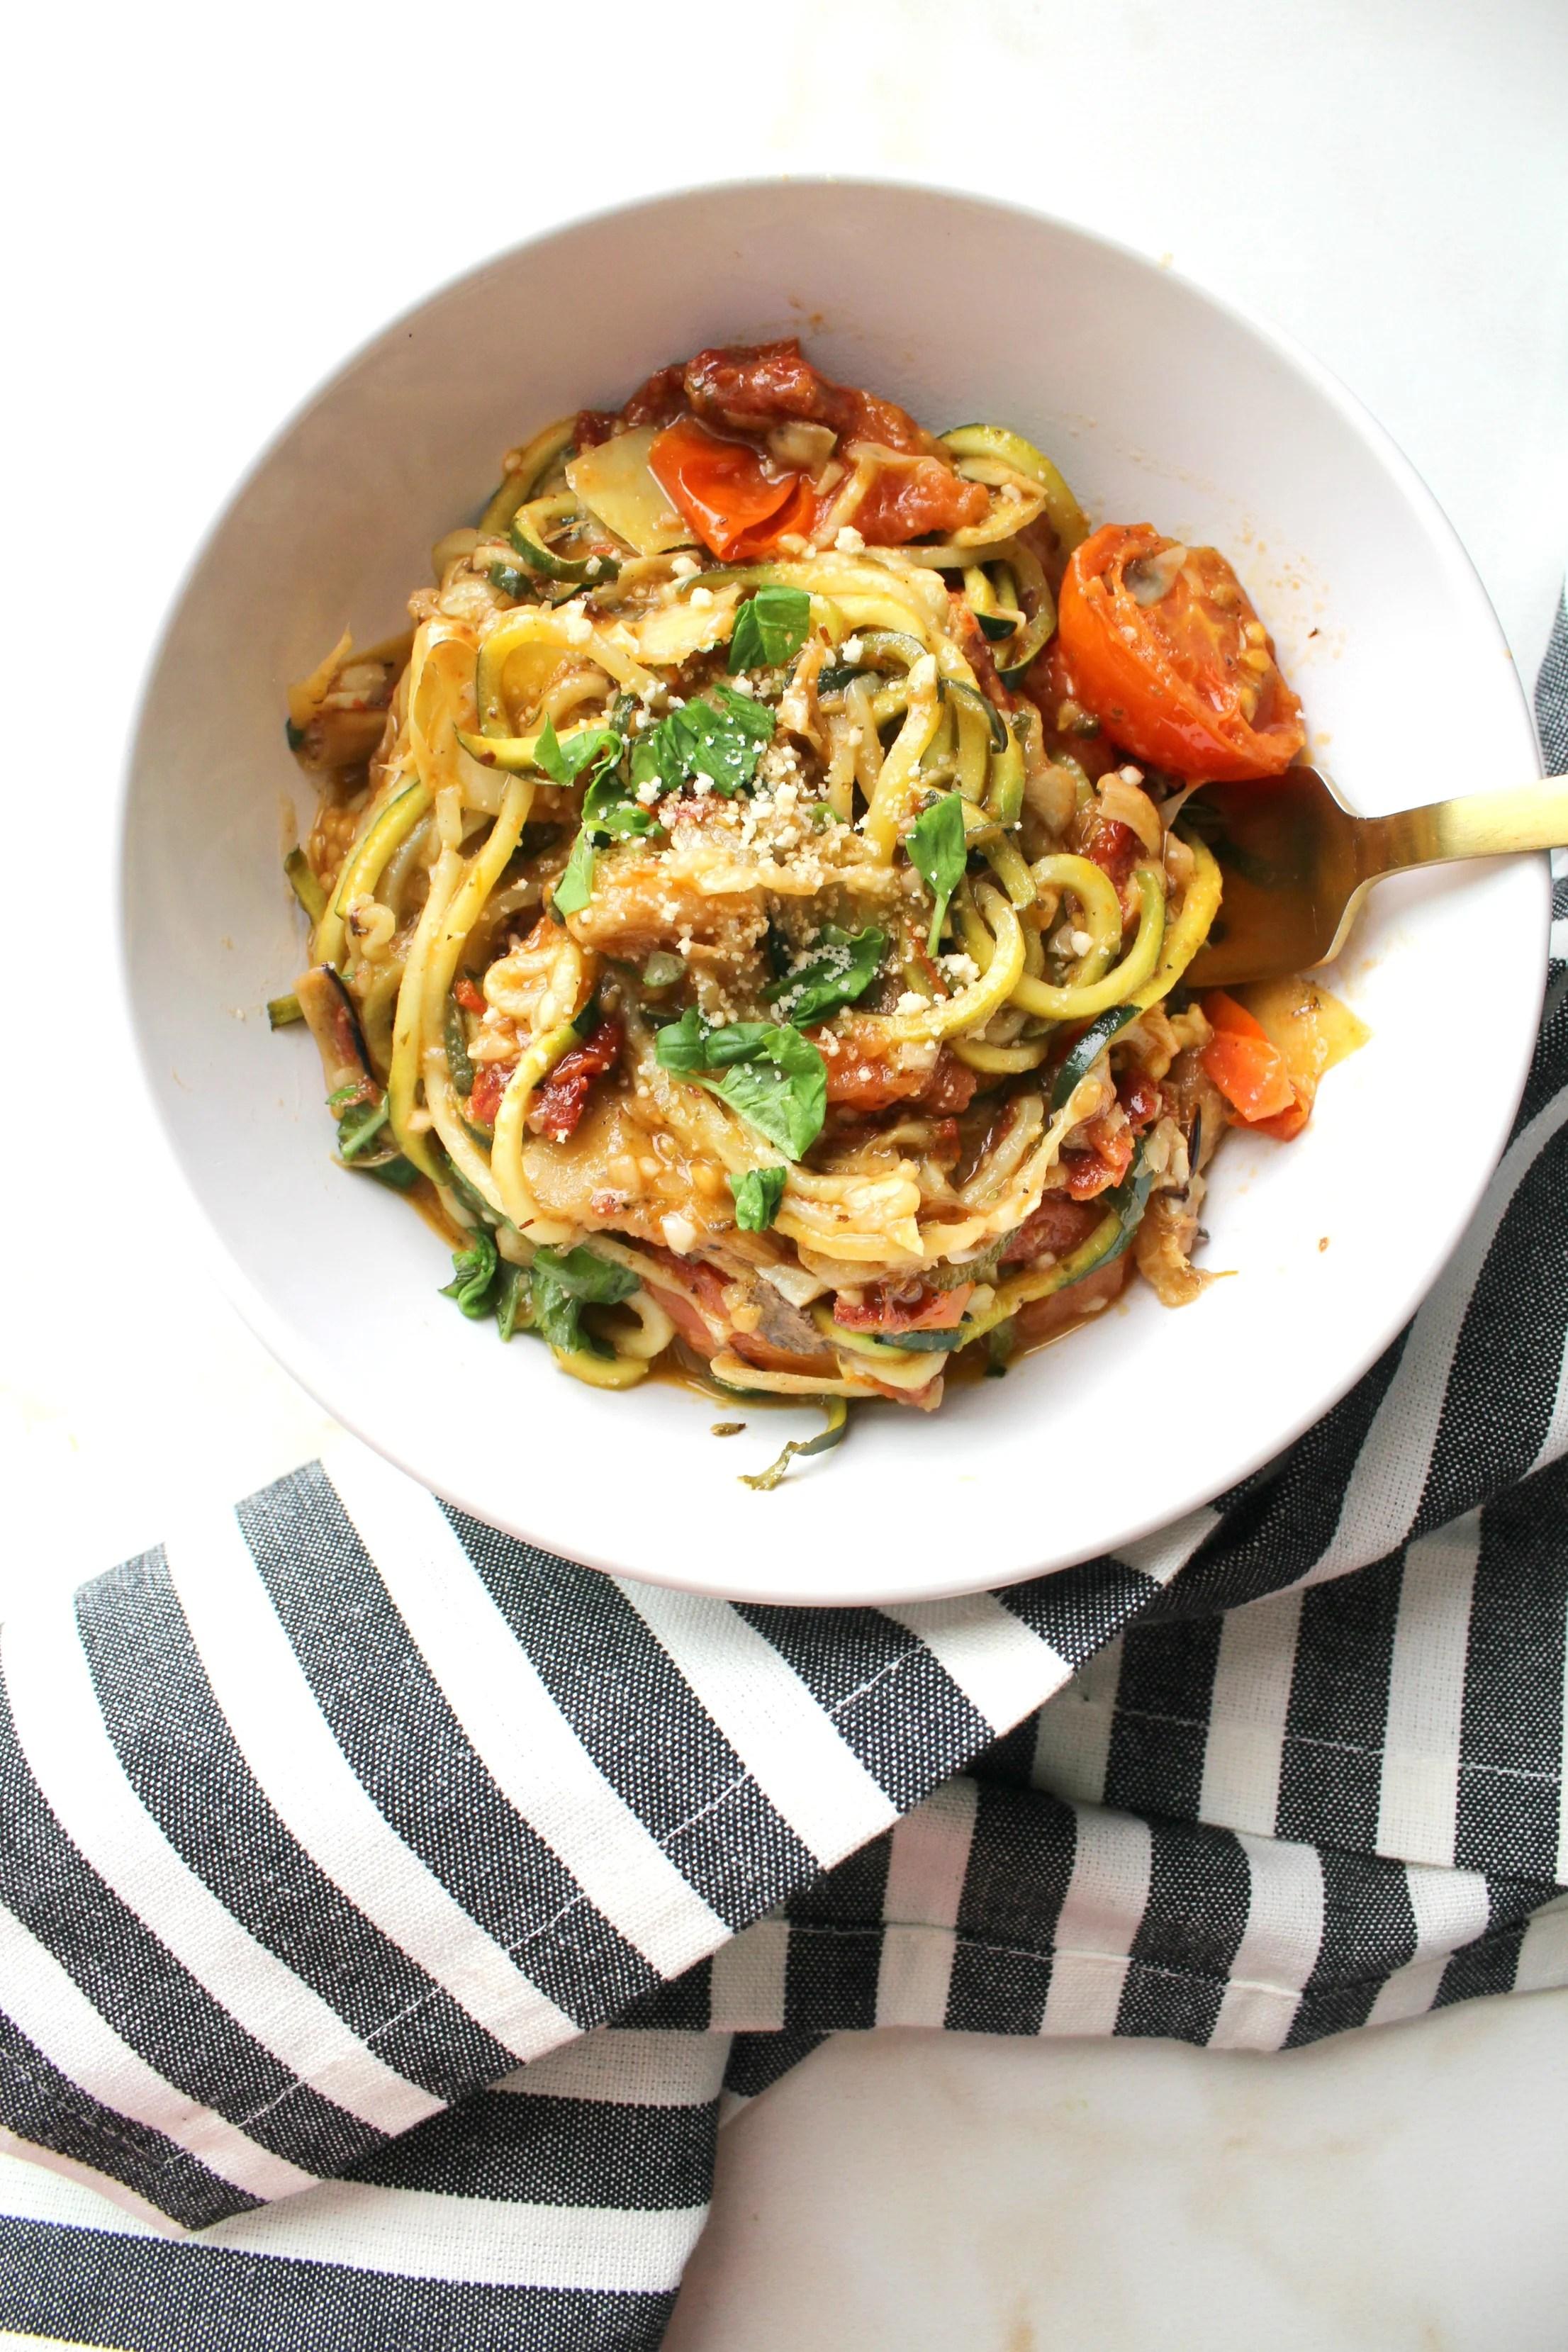 Mediterranean Zucchini Noodles This Savory Vegan